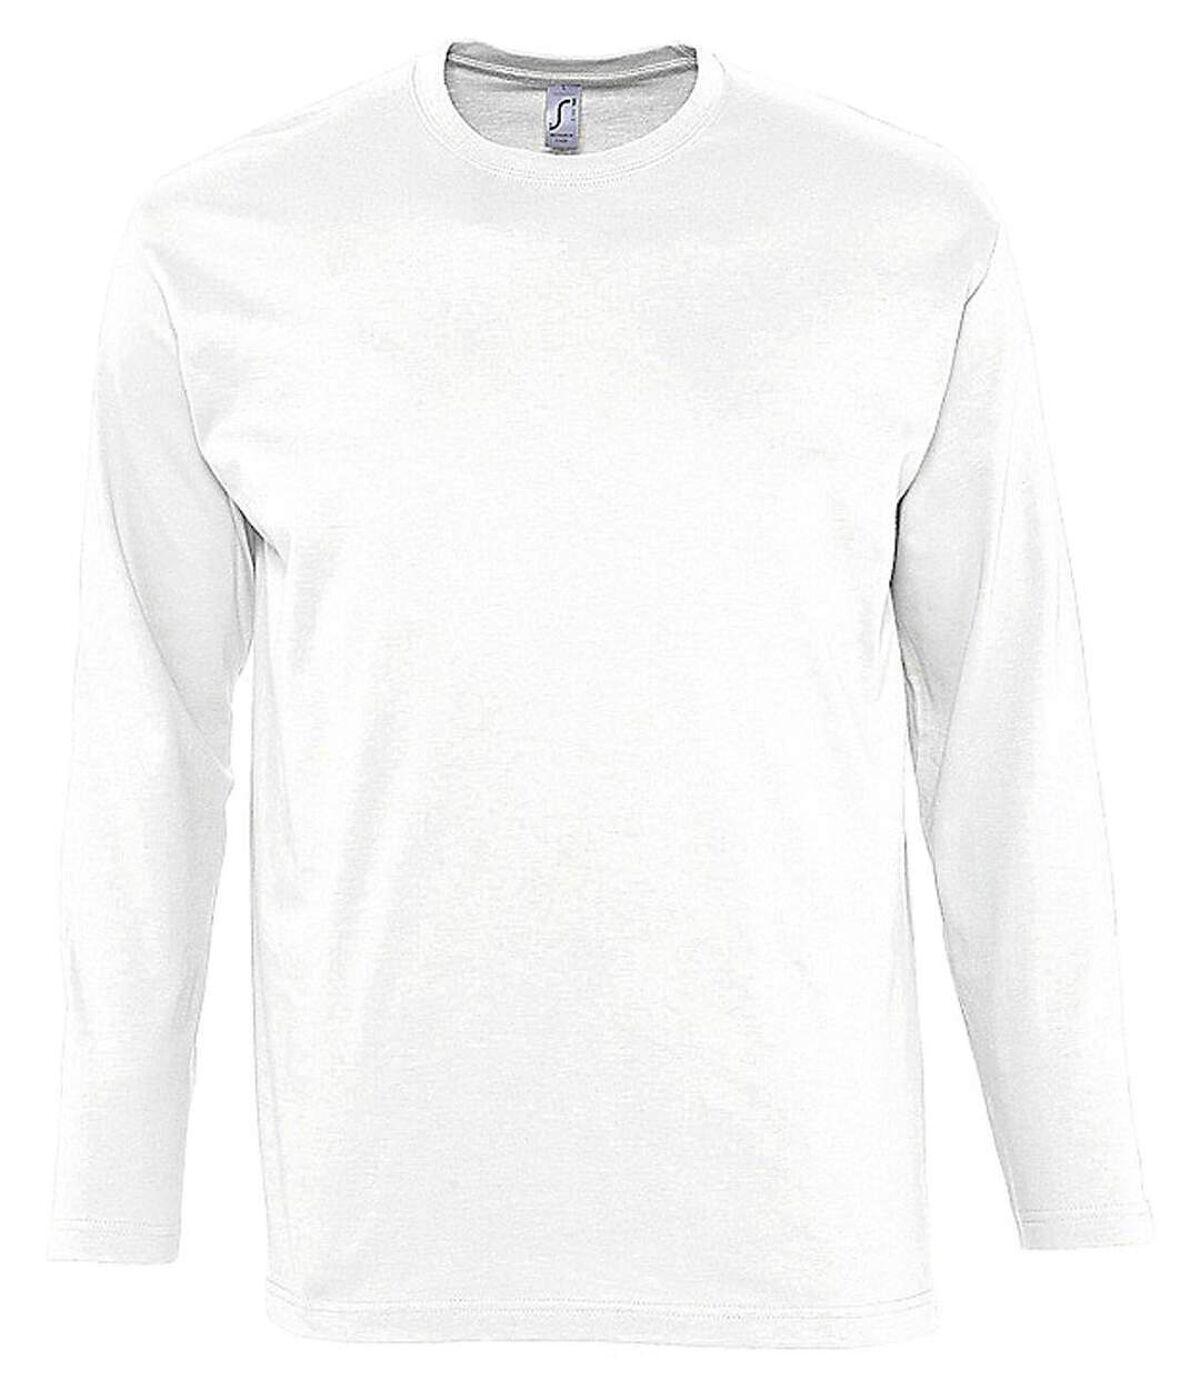 T-shirt manches longues HOMME - 11420 - blanc